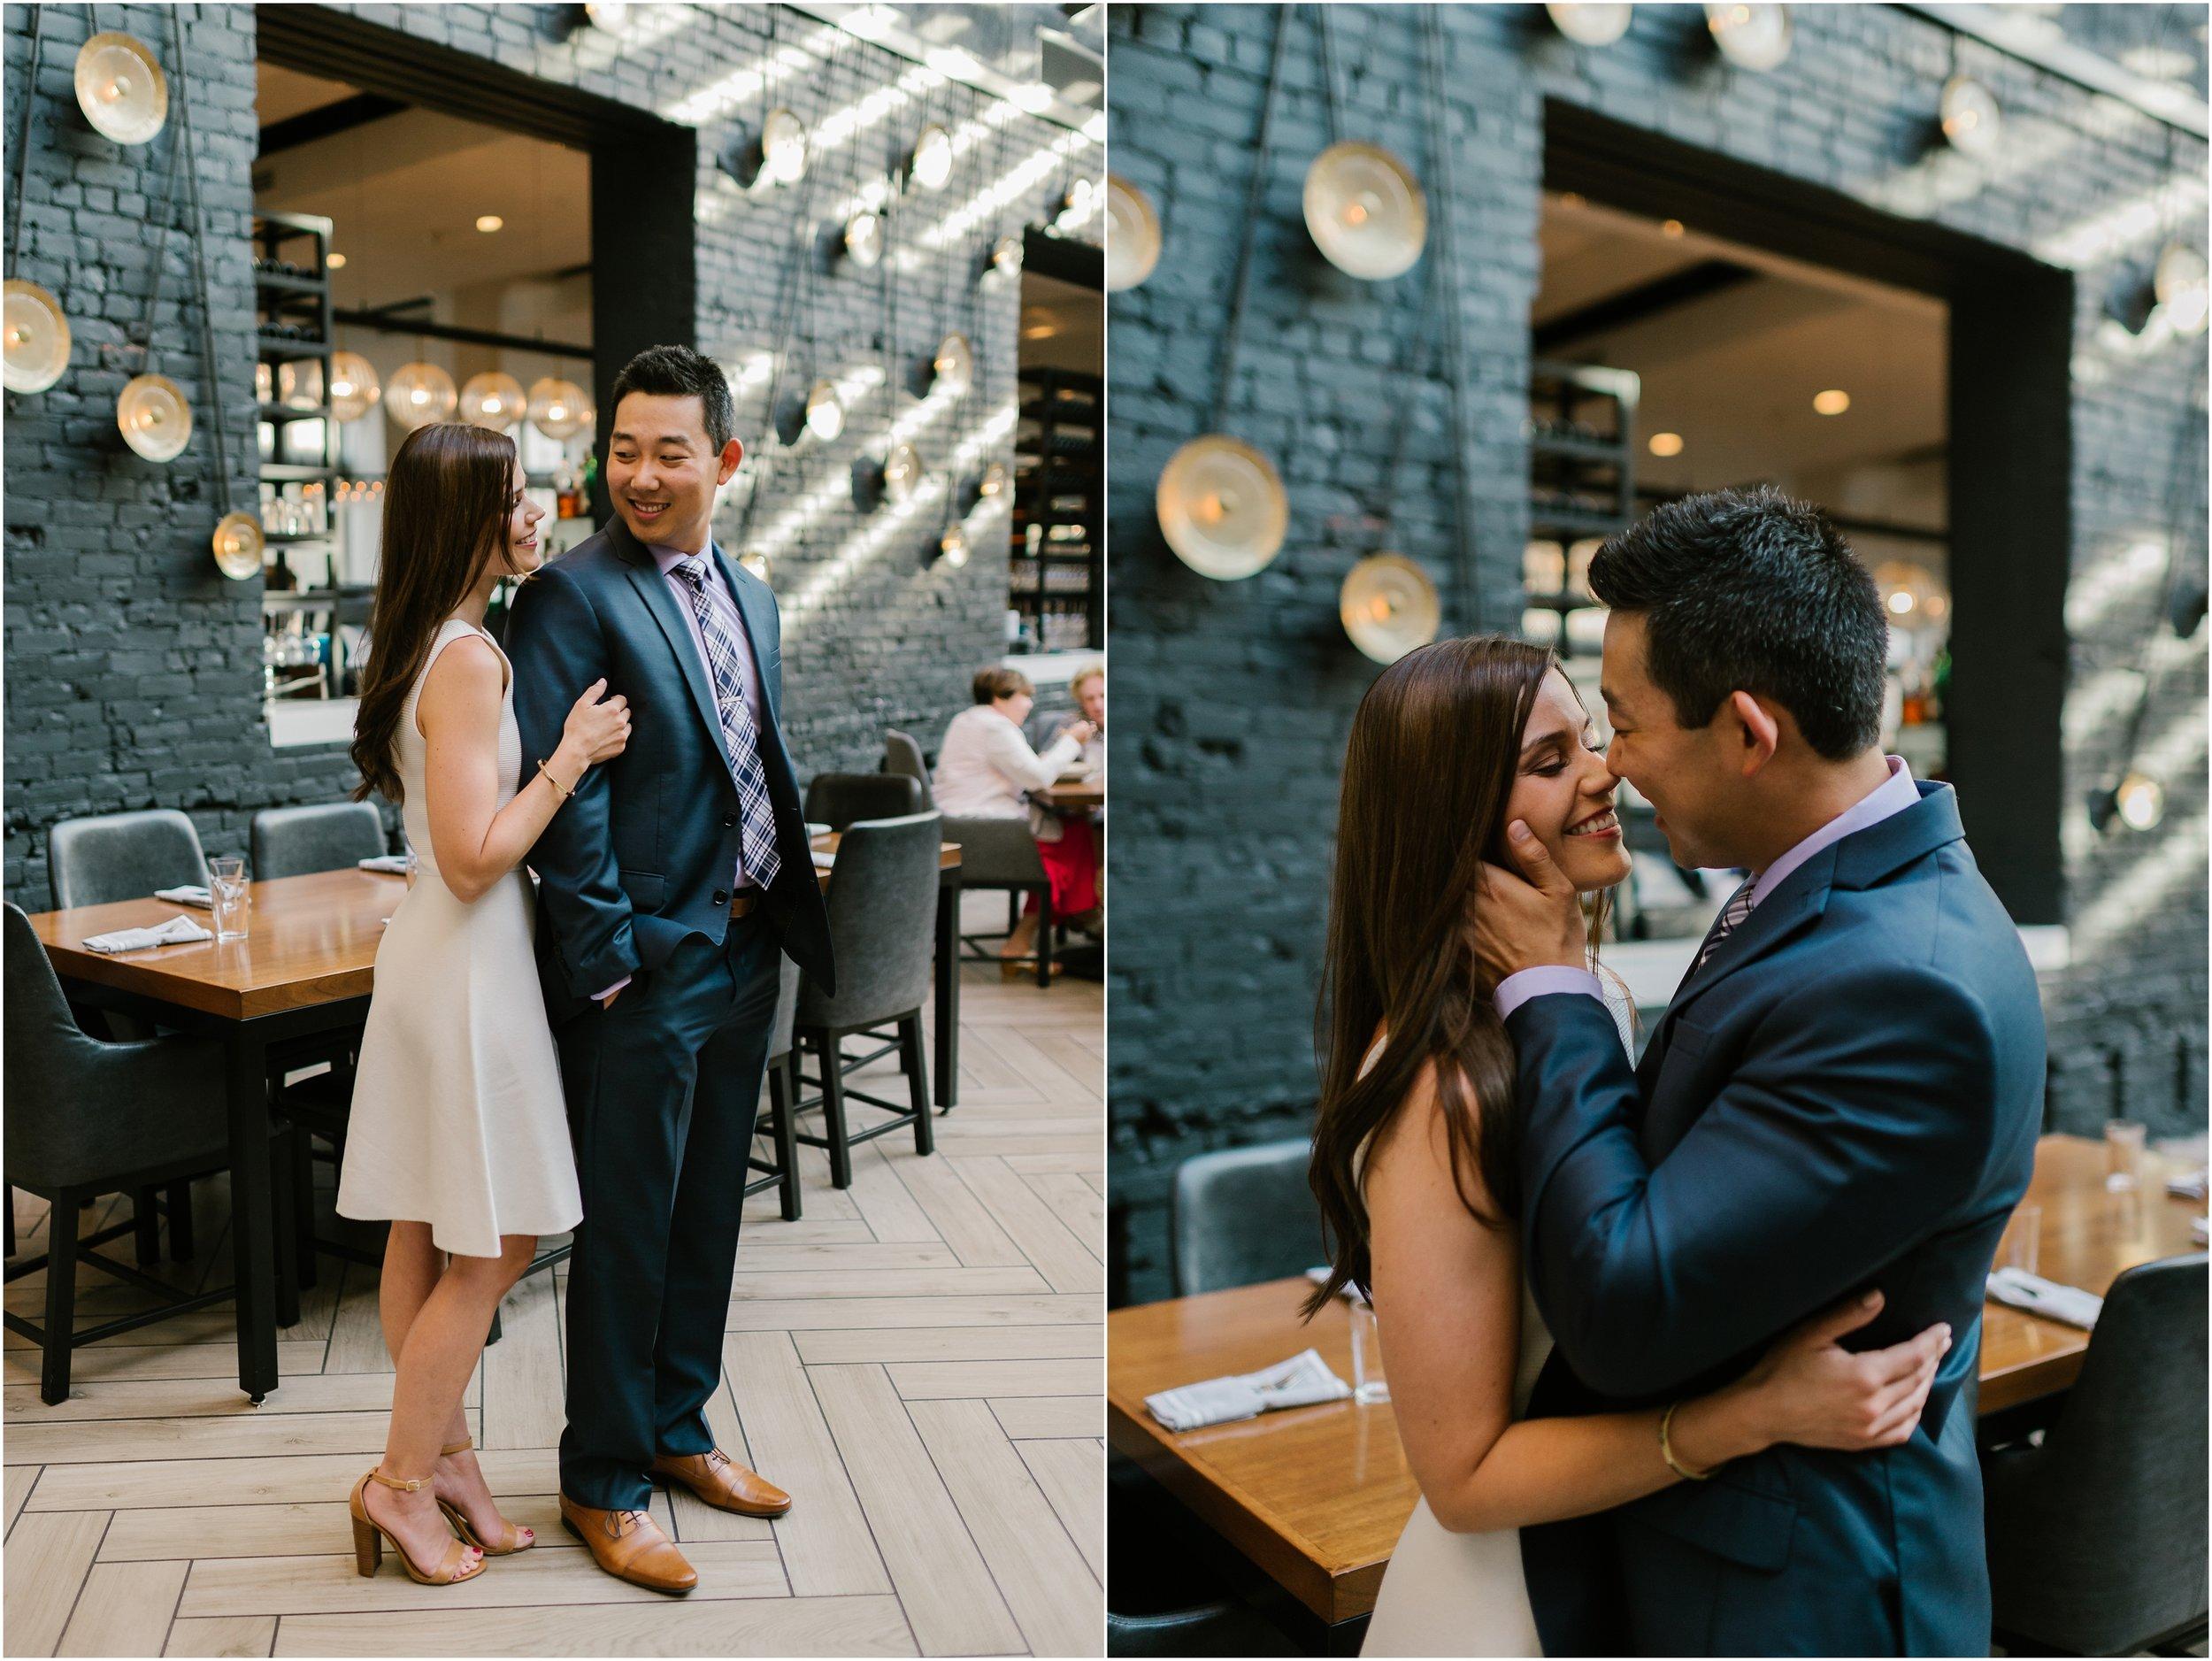 Rebecca_Shehorn_Photography_Indianapolis_Wedding_Photographer_8470.jpg